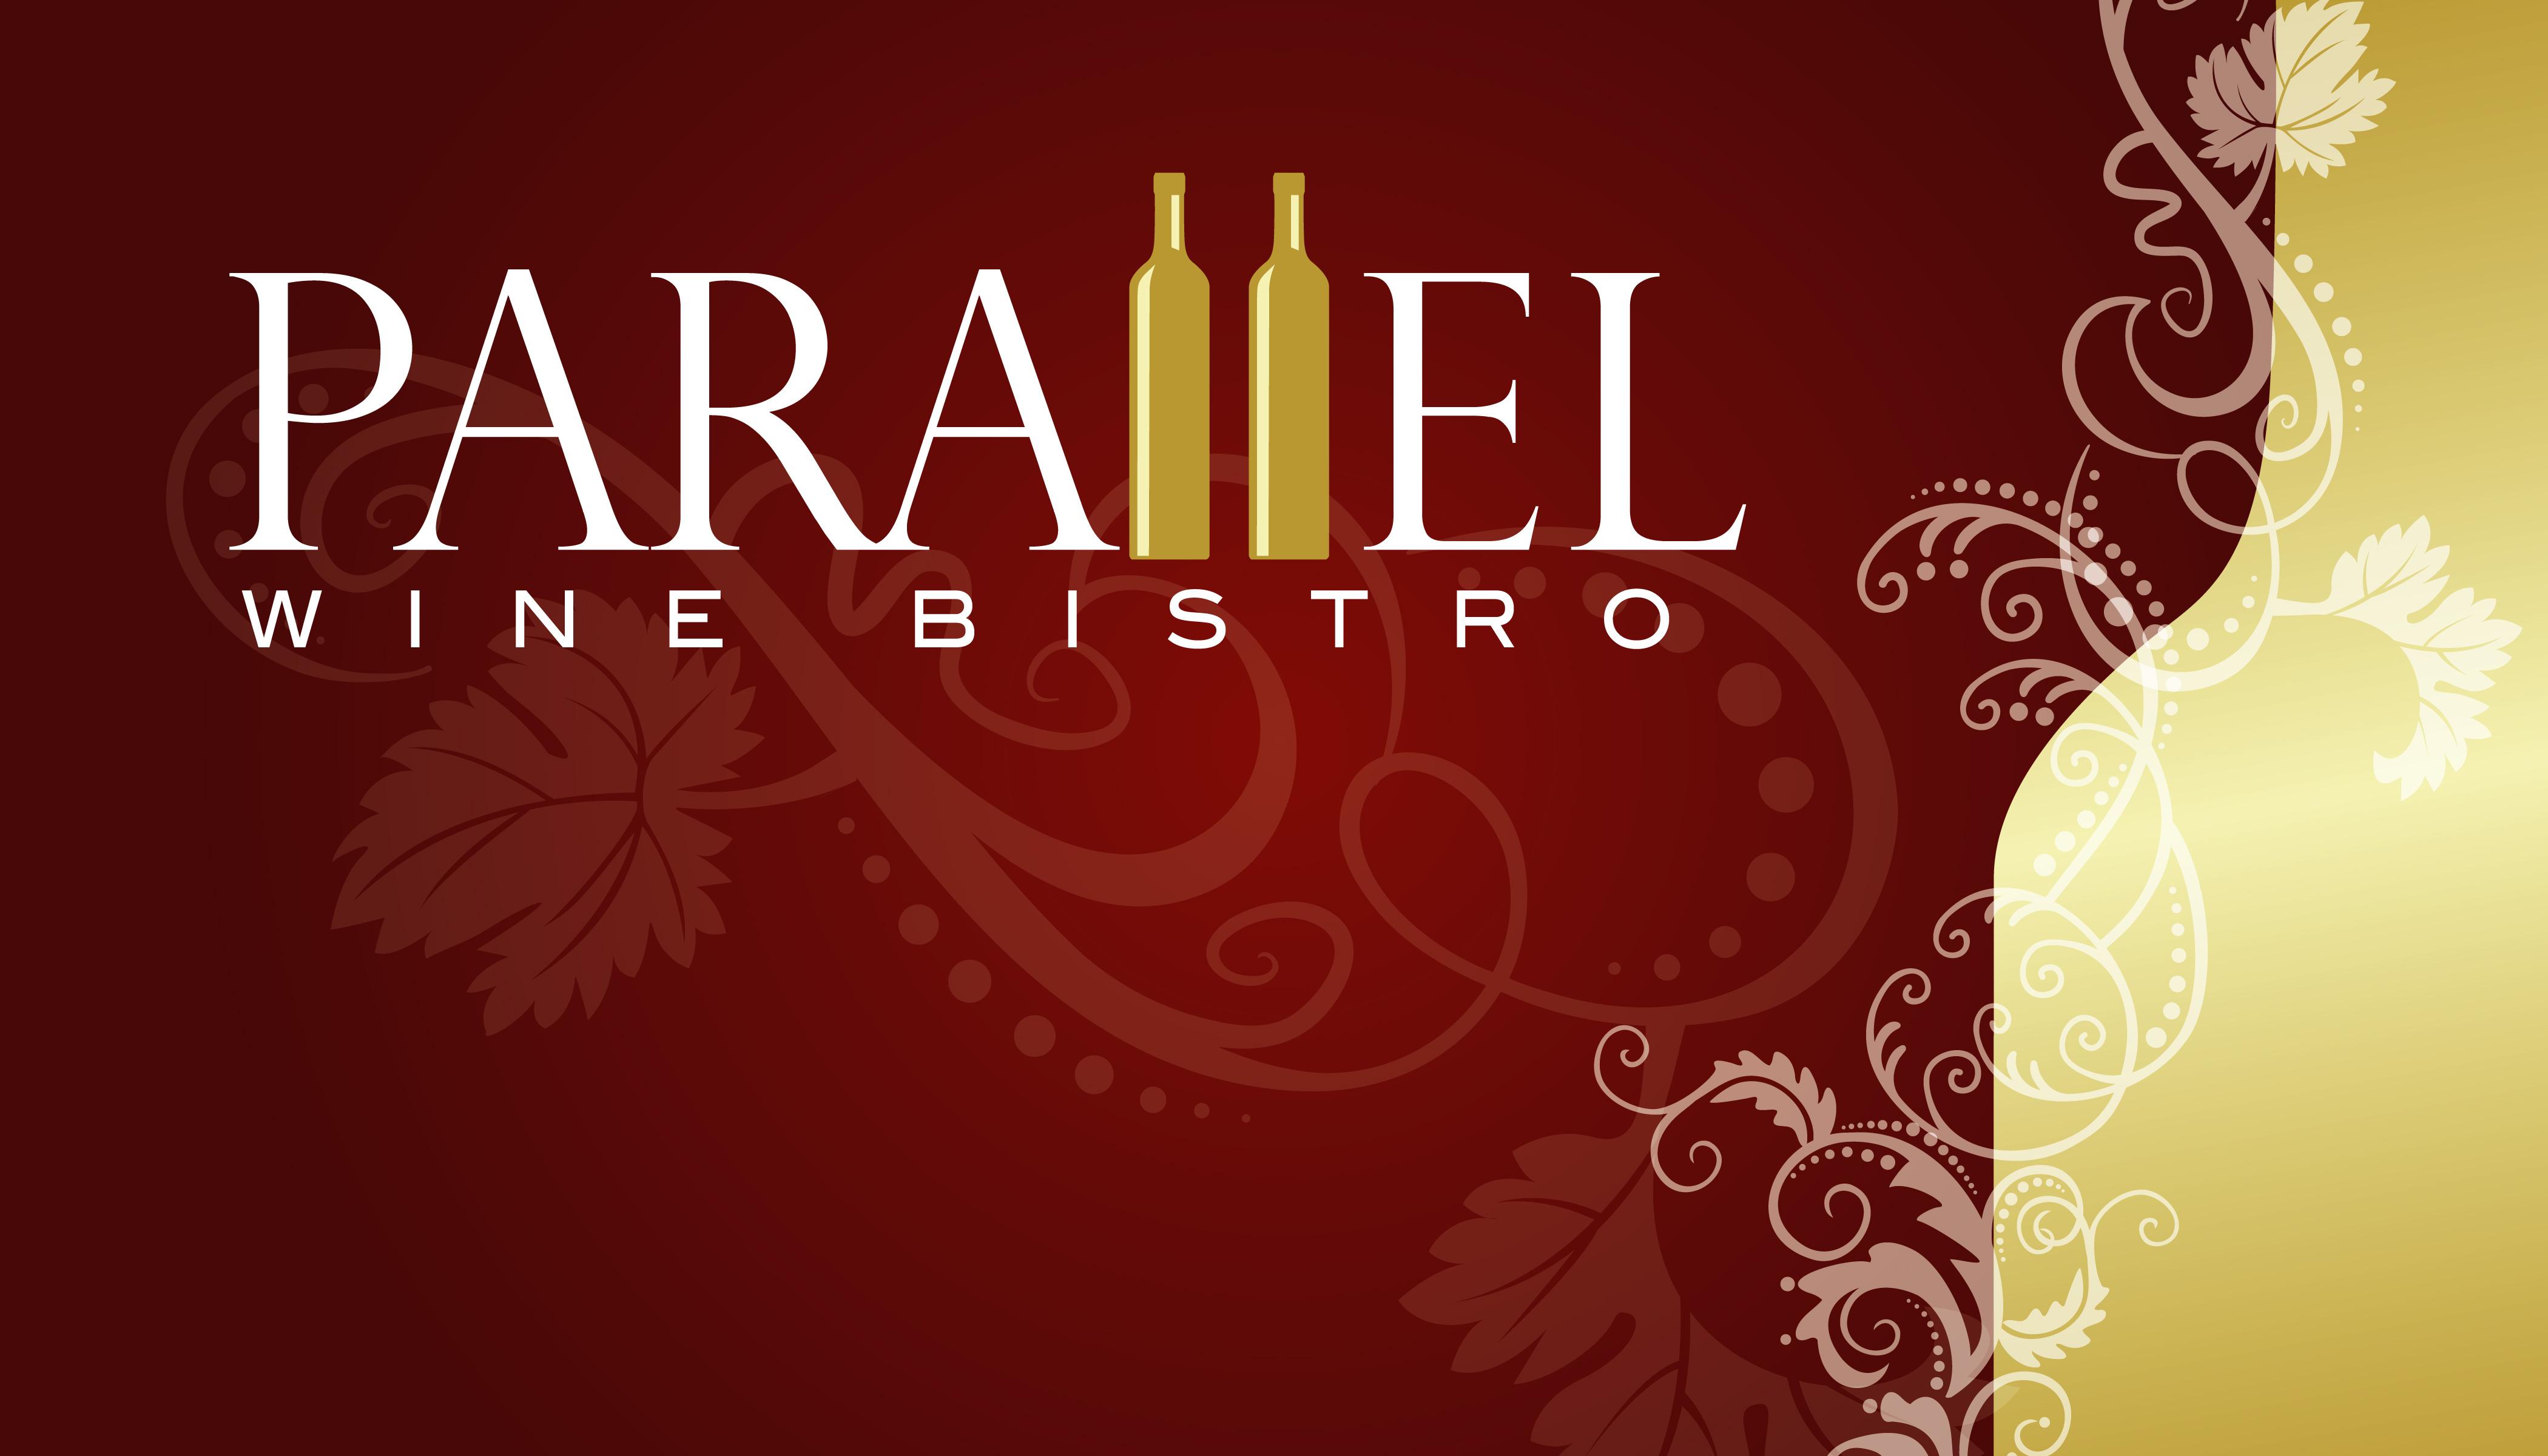 Parallel Wine Bistro